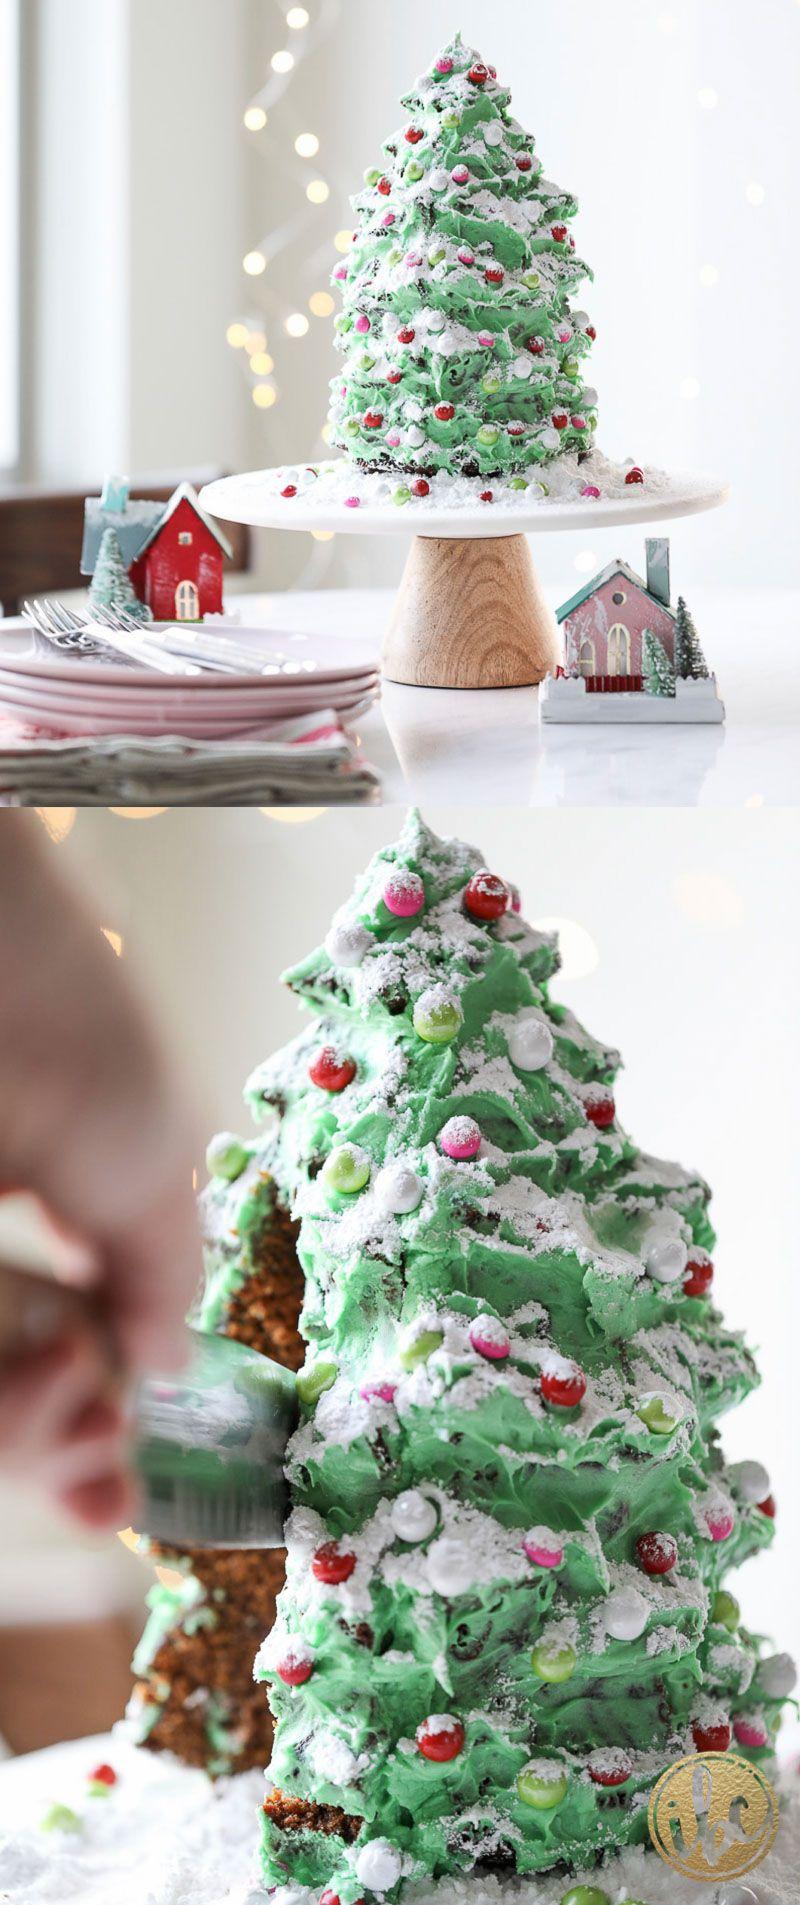 Christmas Tree Gingerbread Cake dessert recipe Christmas